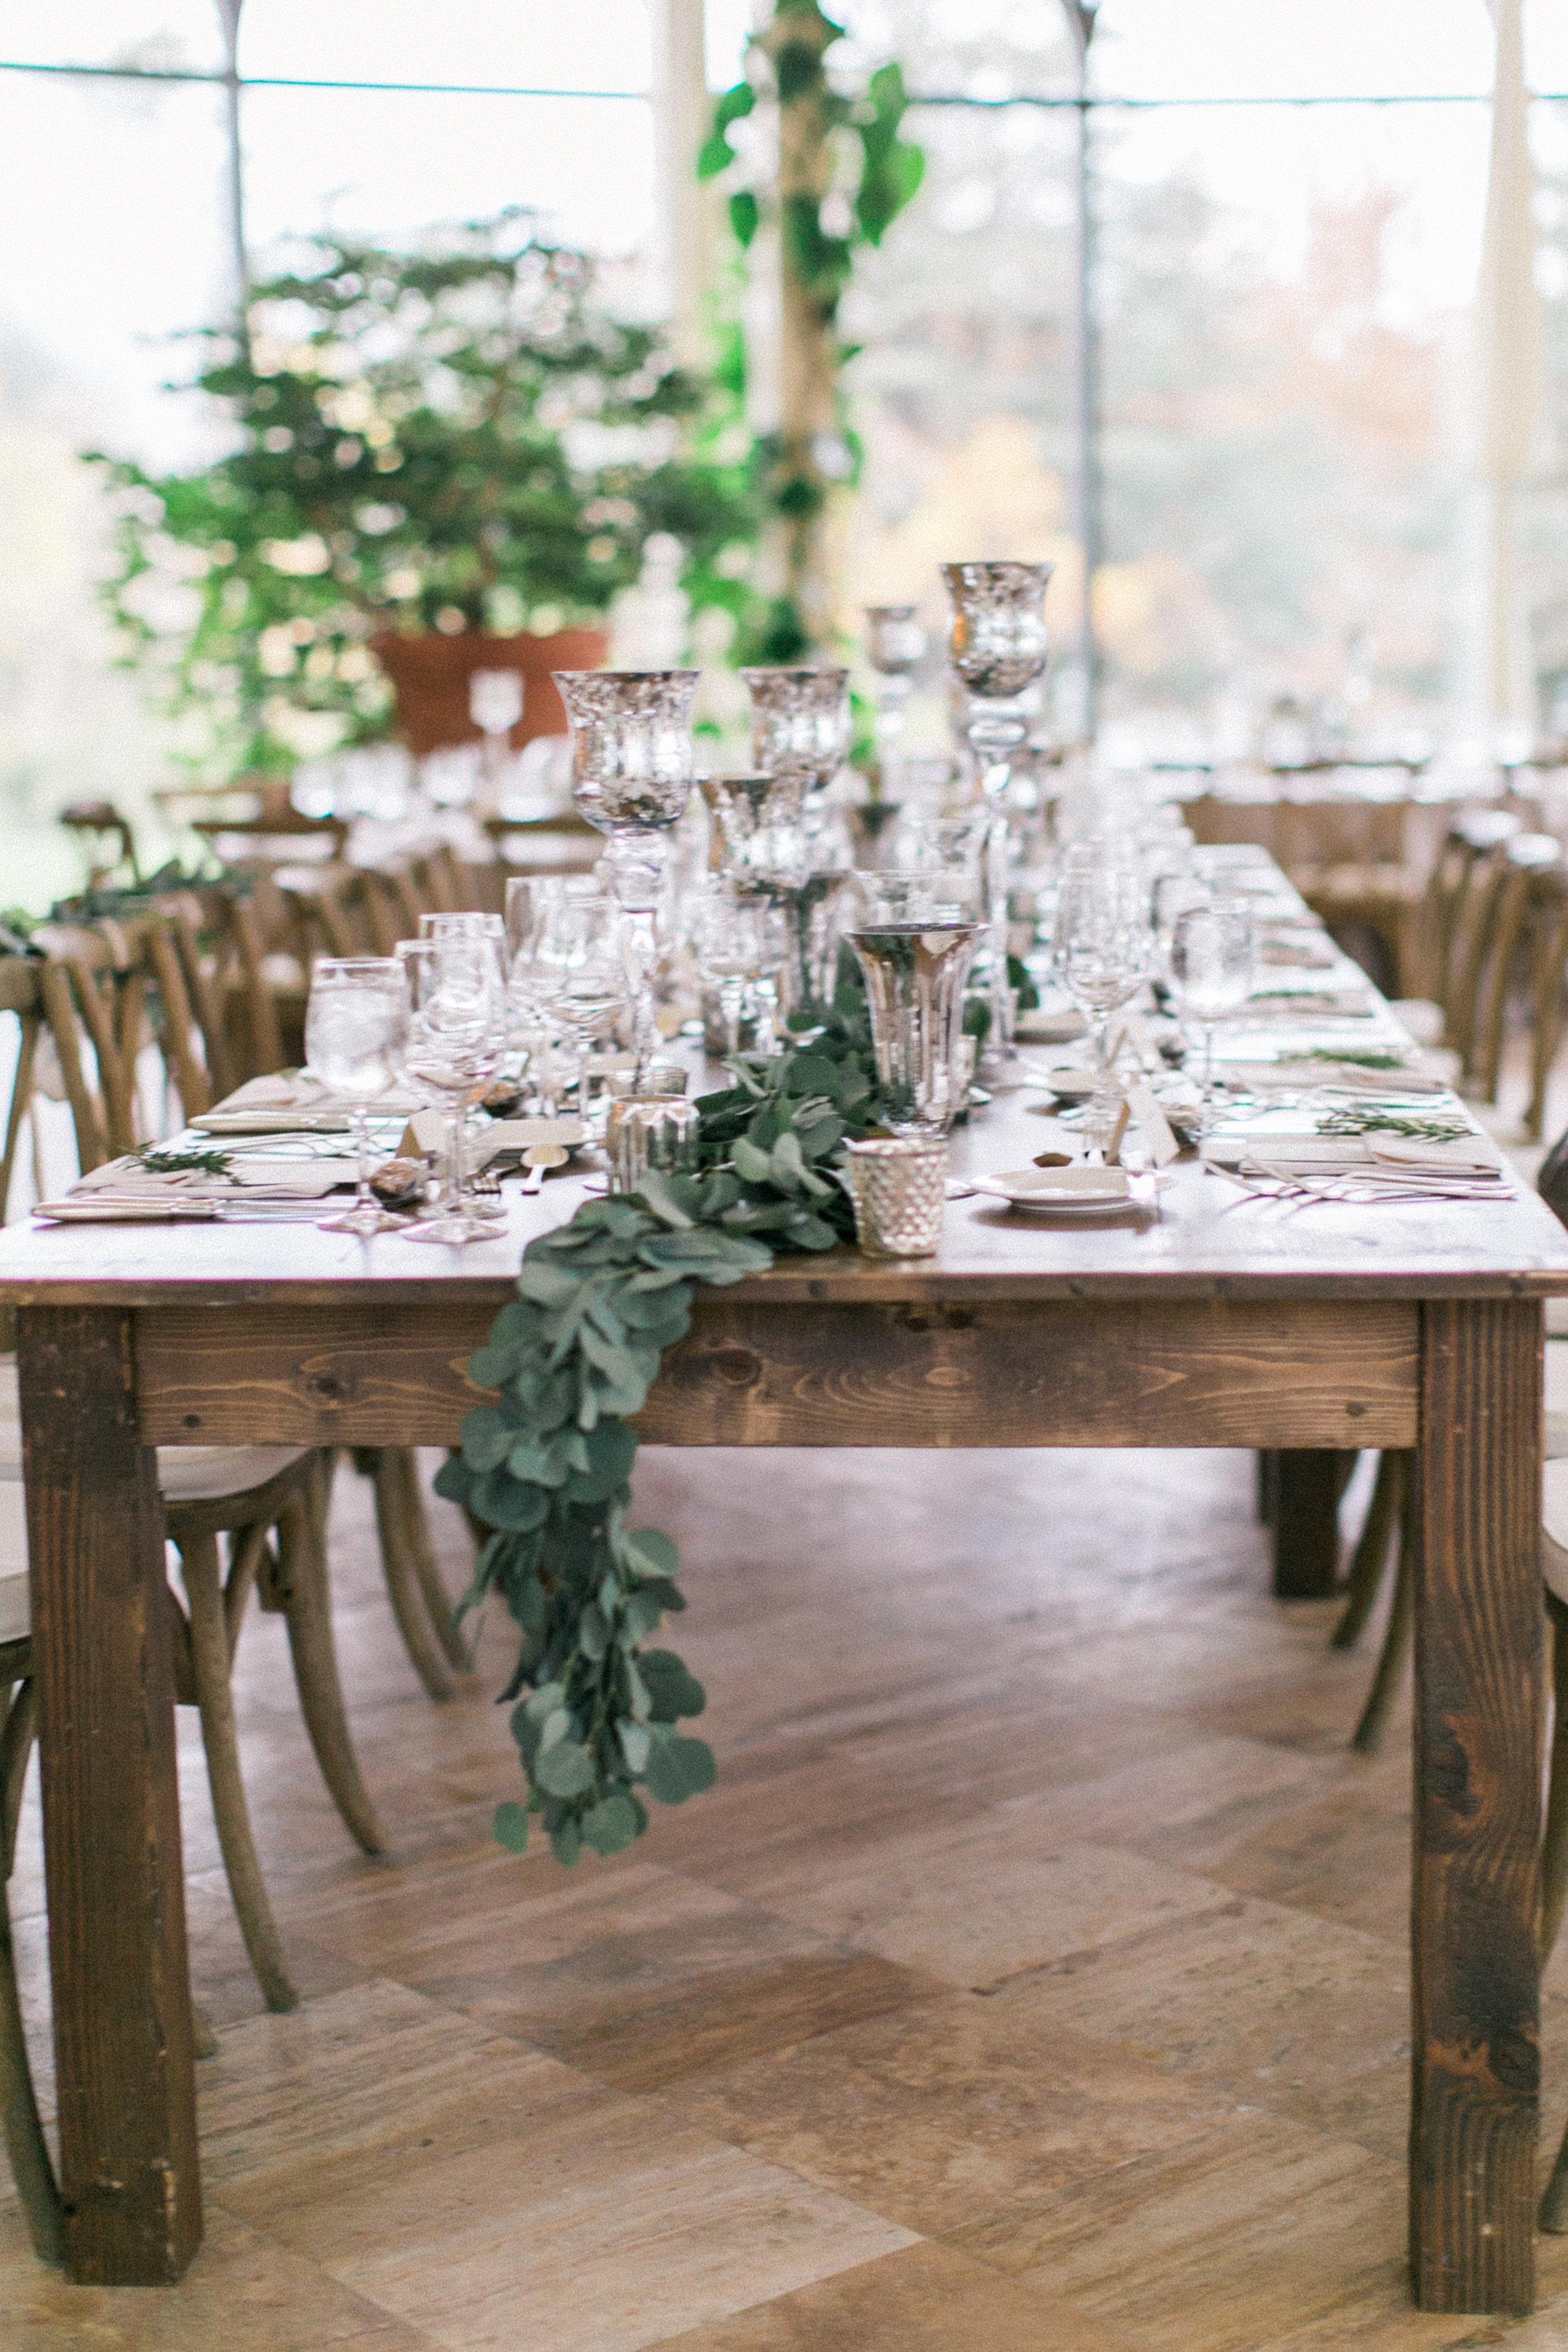 NJ Wedding, Princeton Wedding, Centerpiece, Succulent, Air Plant, Table Decor, Caroline Frost Photography